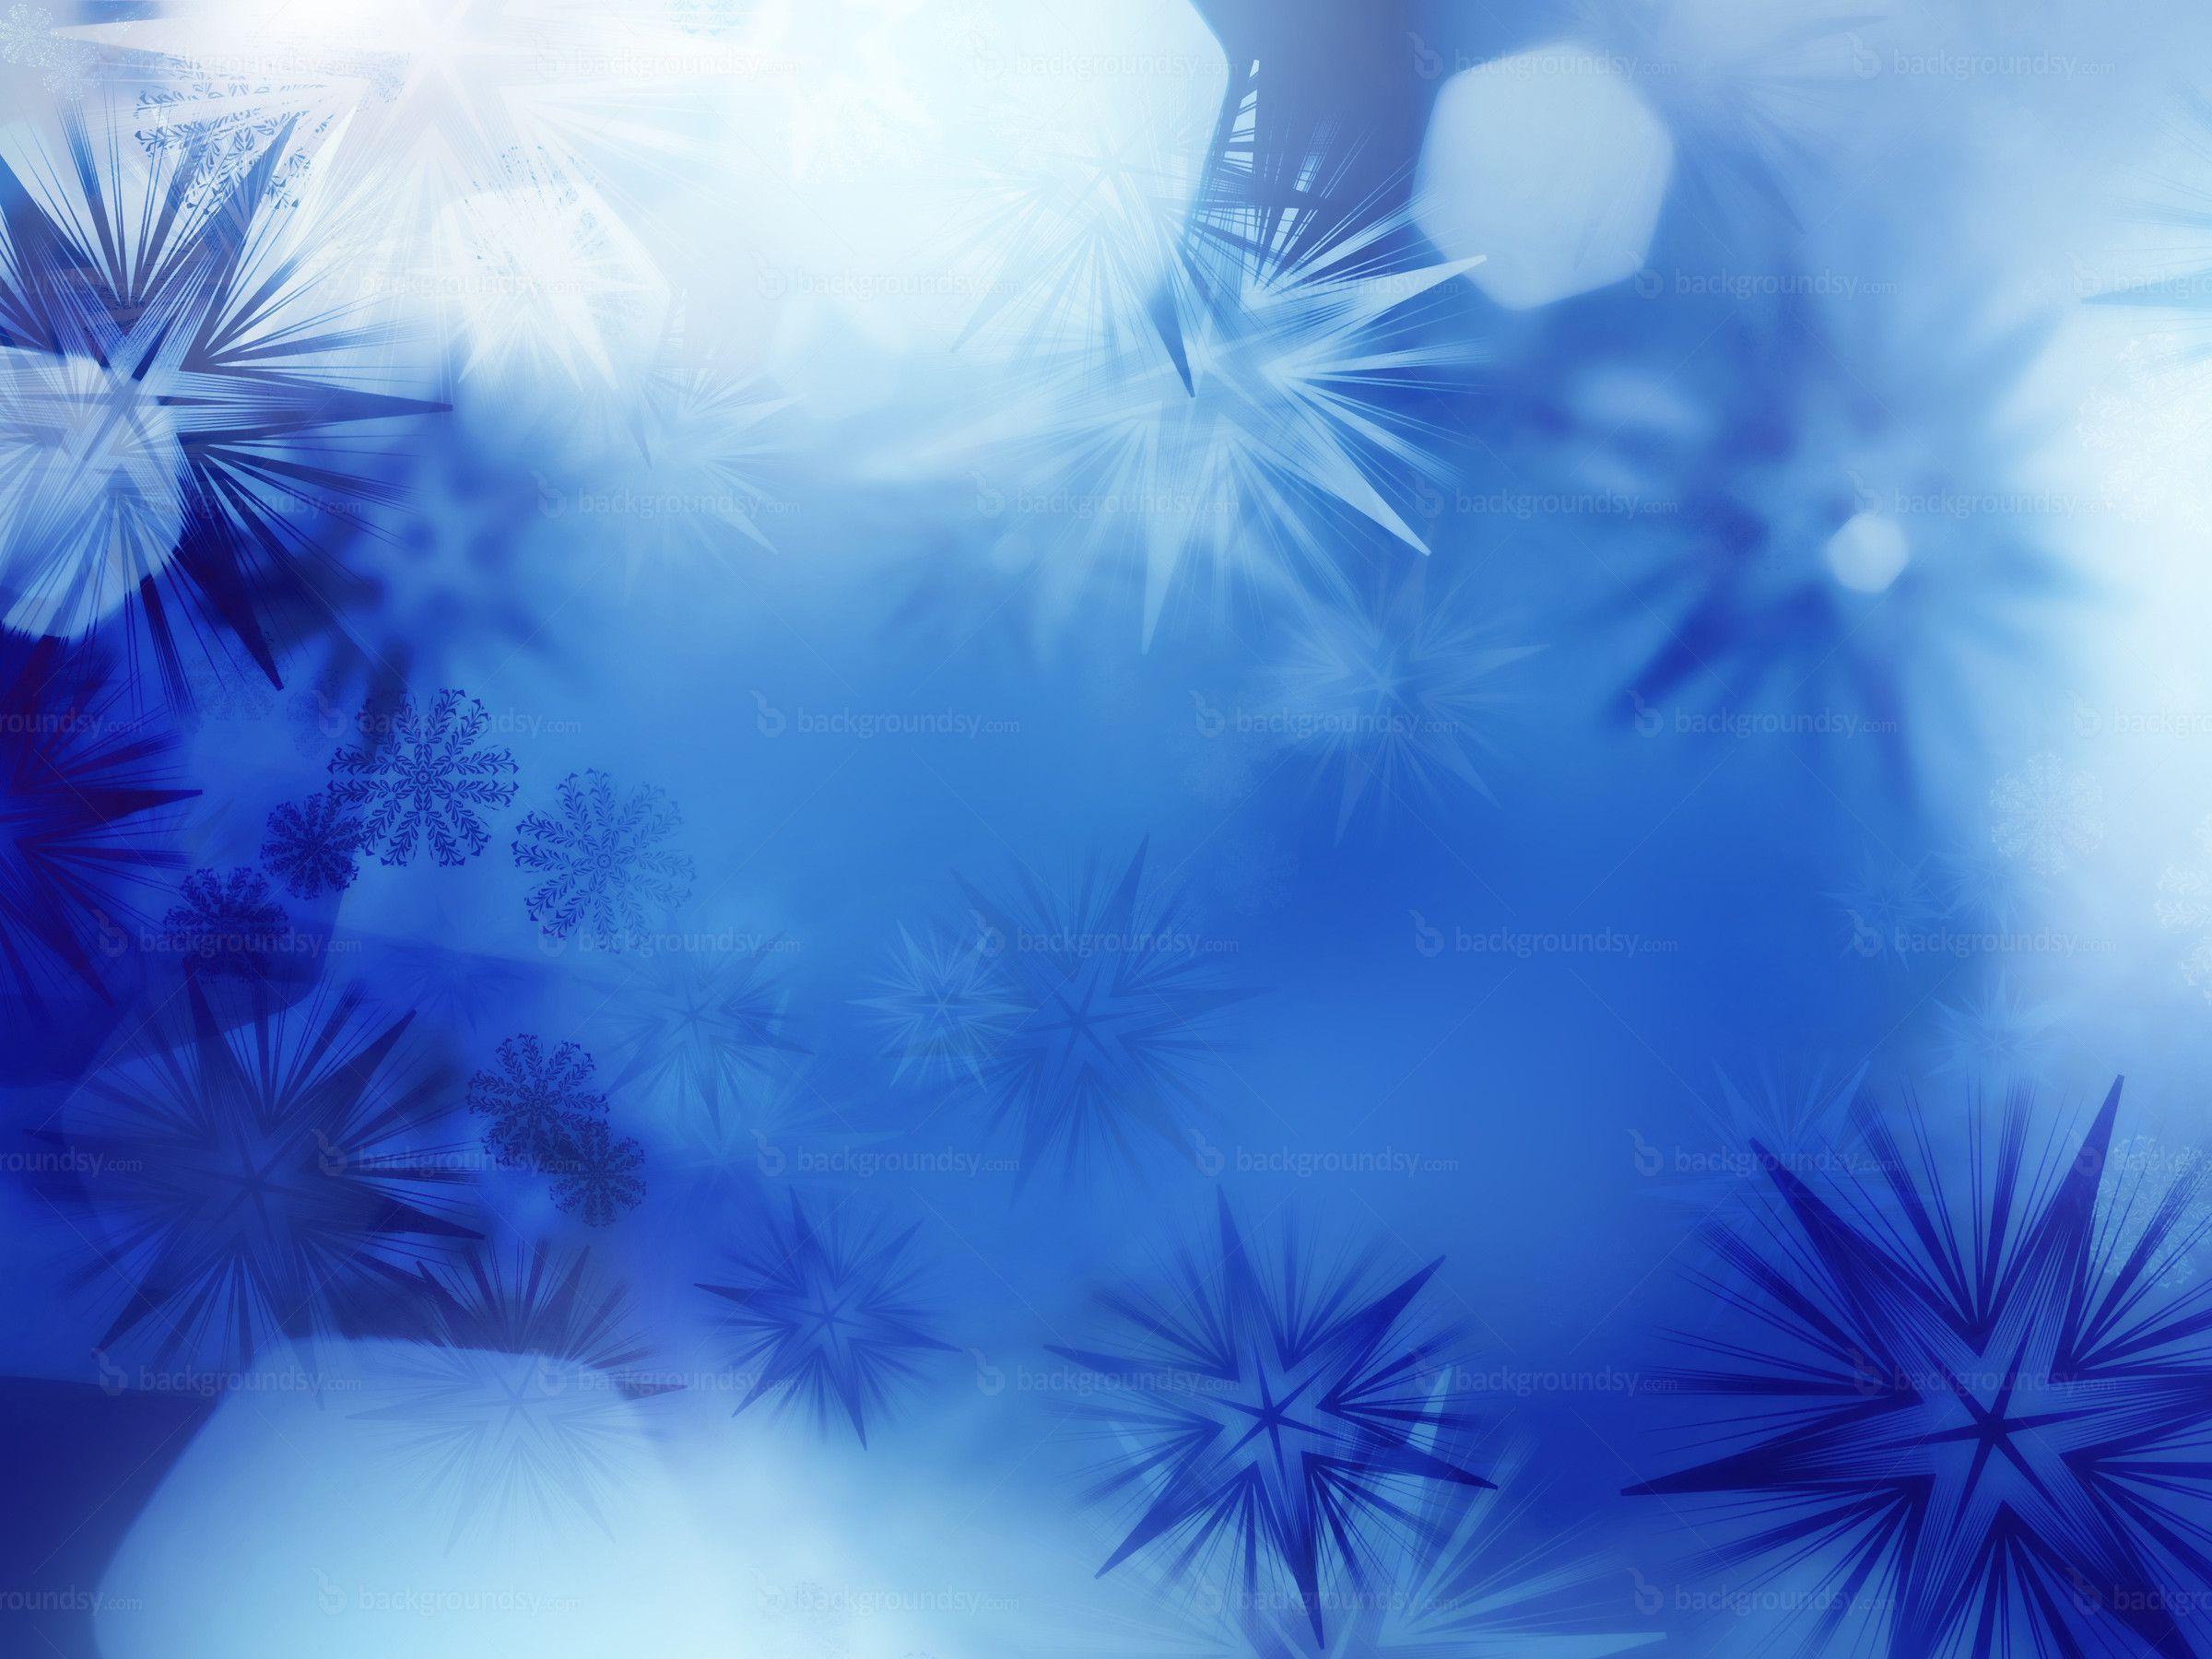 Snowflake Backgrounds For Desktop